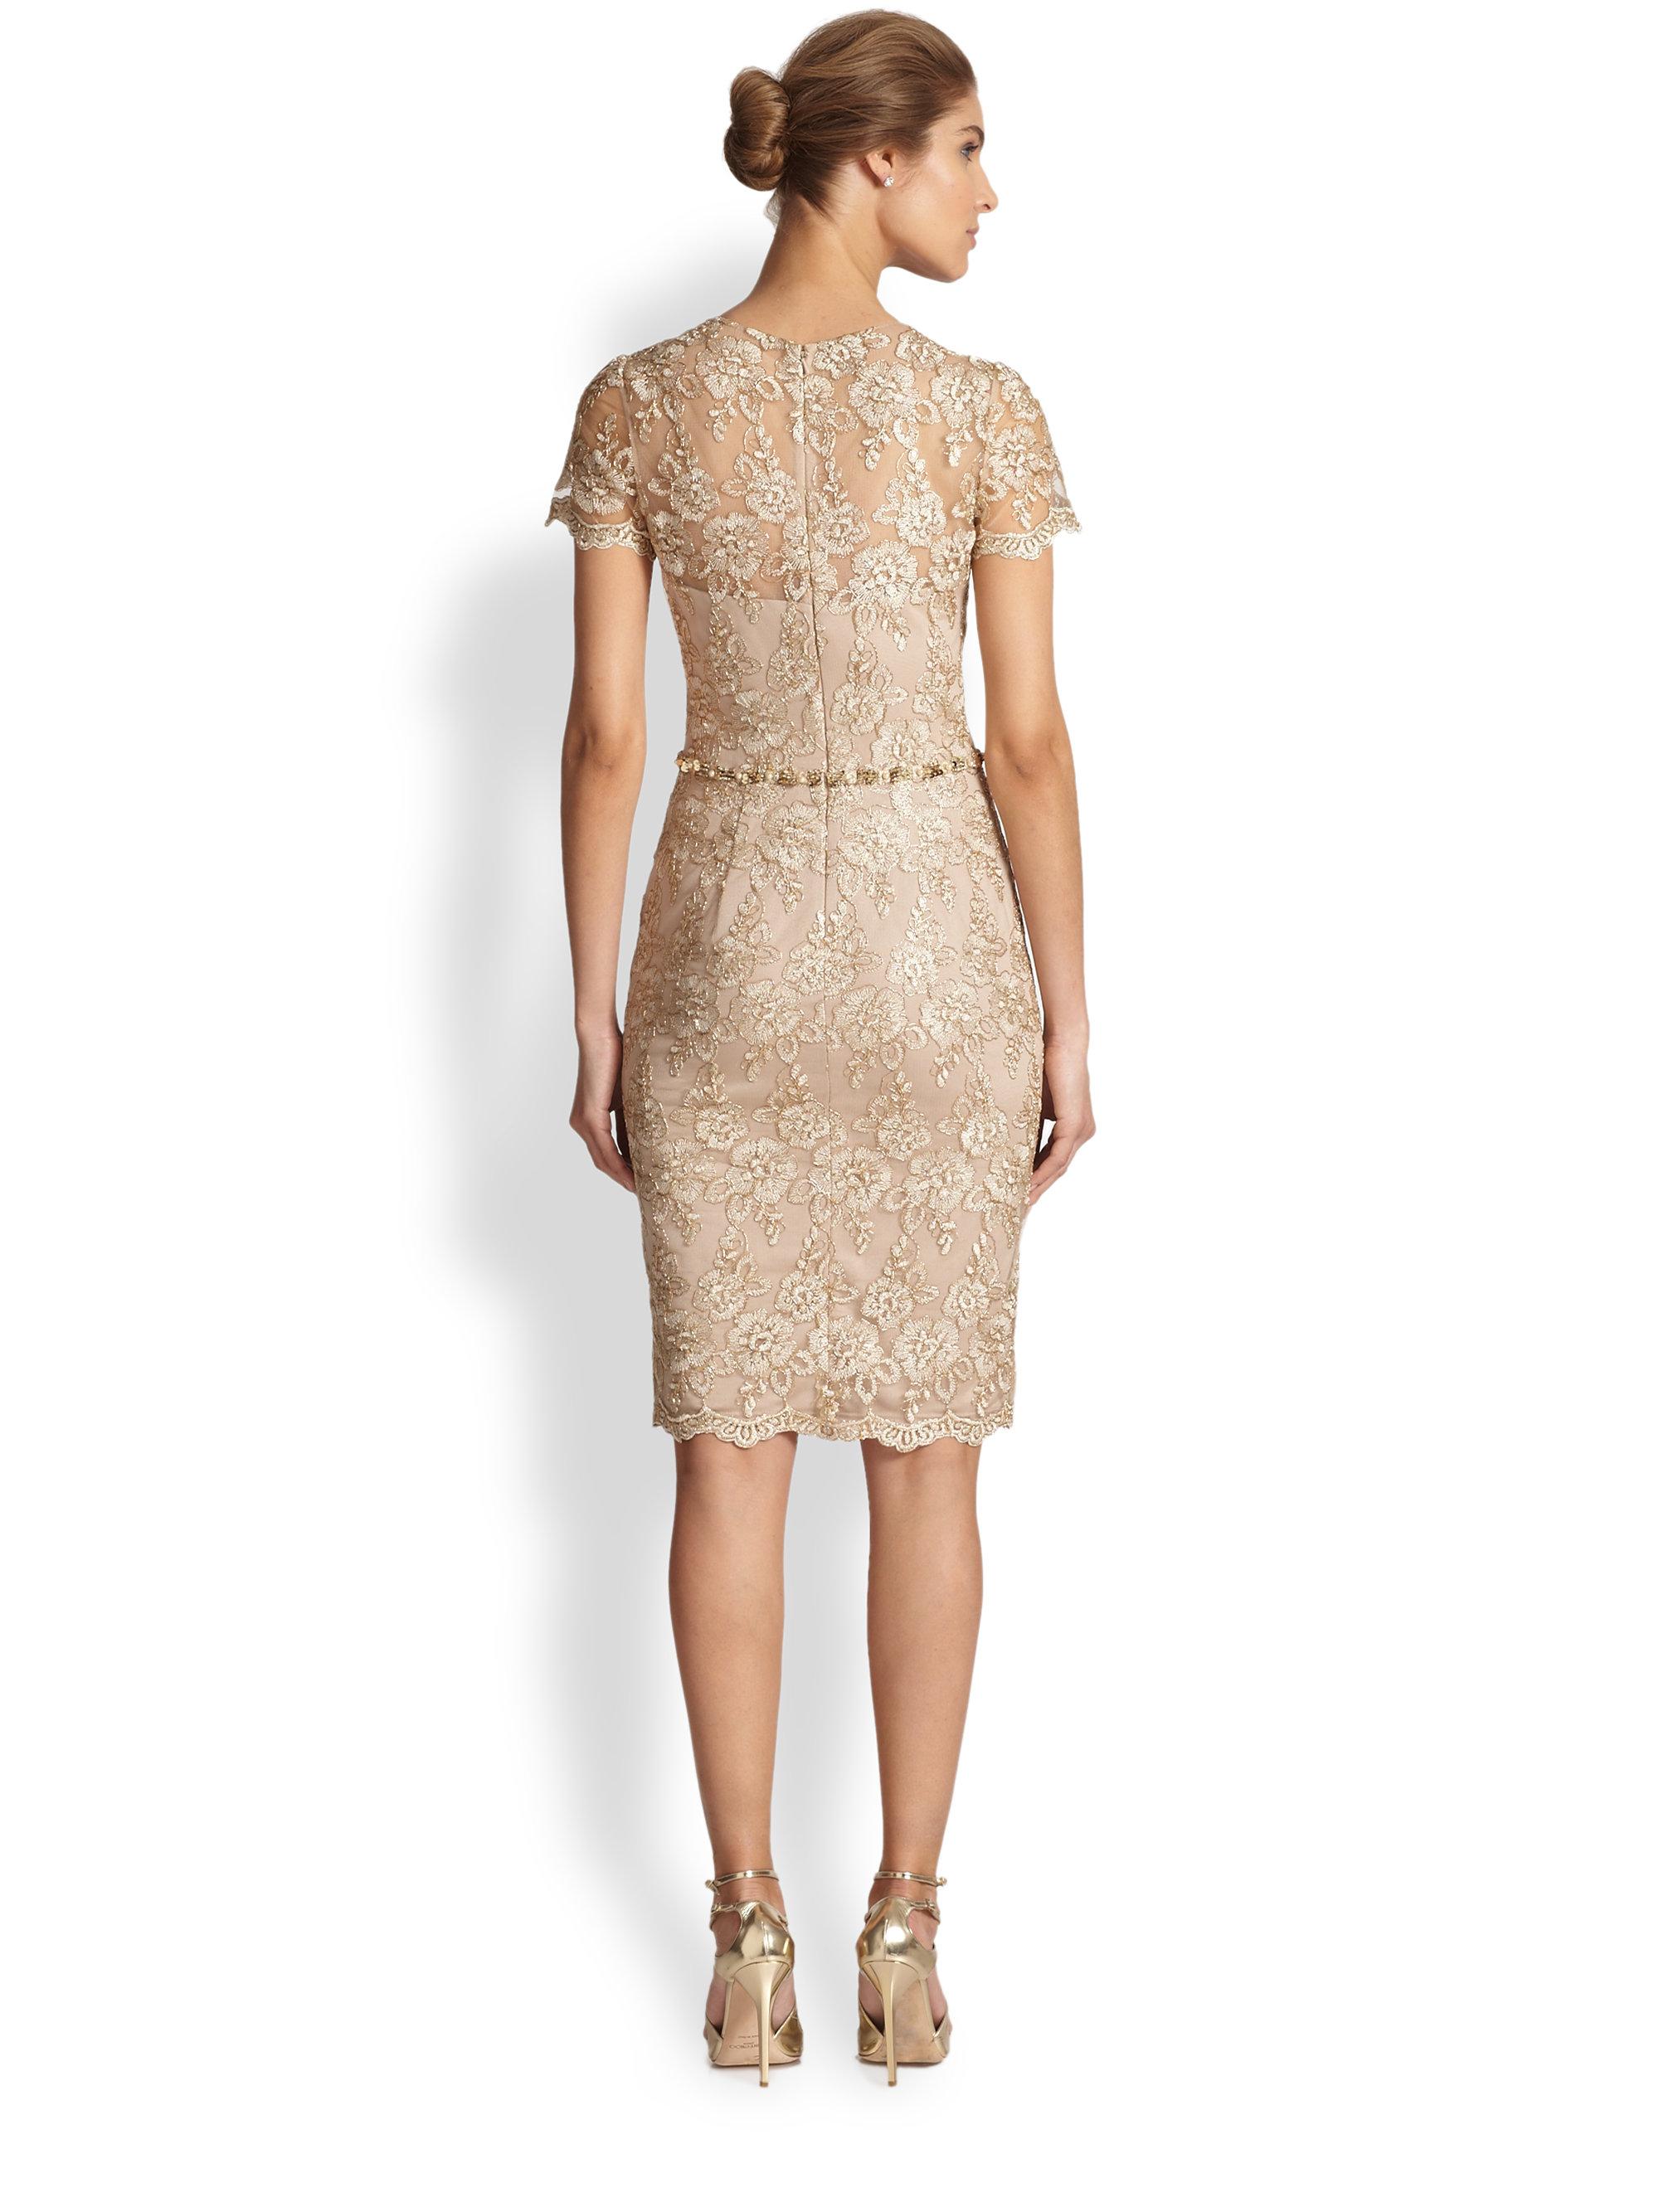 David meister short sleeve dress with lace overlay – Dress blog Edin